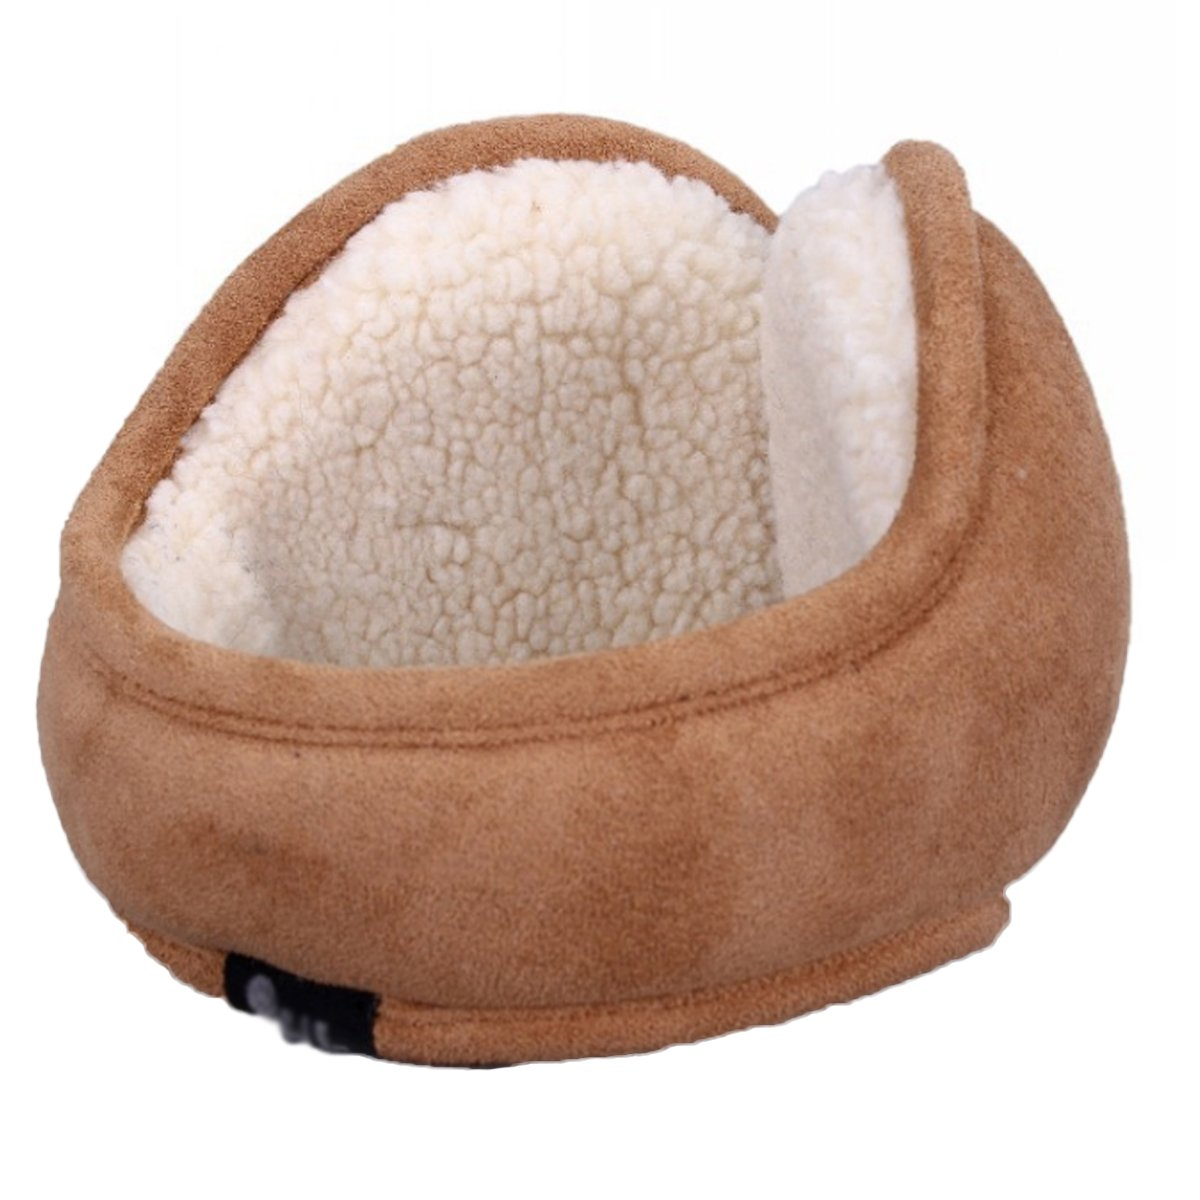 Surblue Winter Warm Earwarmer Knitted Earmuffs with Shearling Sheepskin ZL-EZ00-M